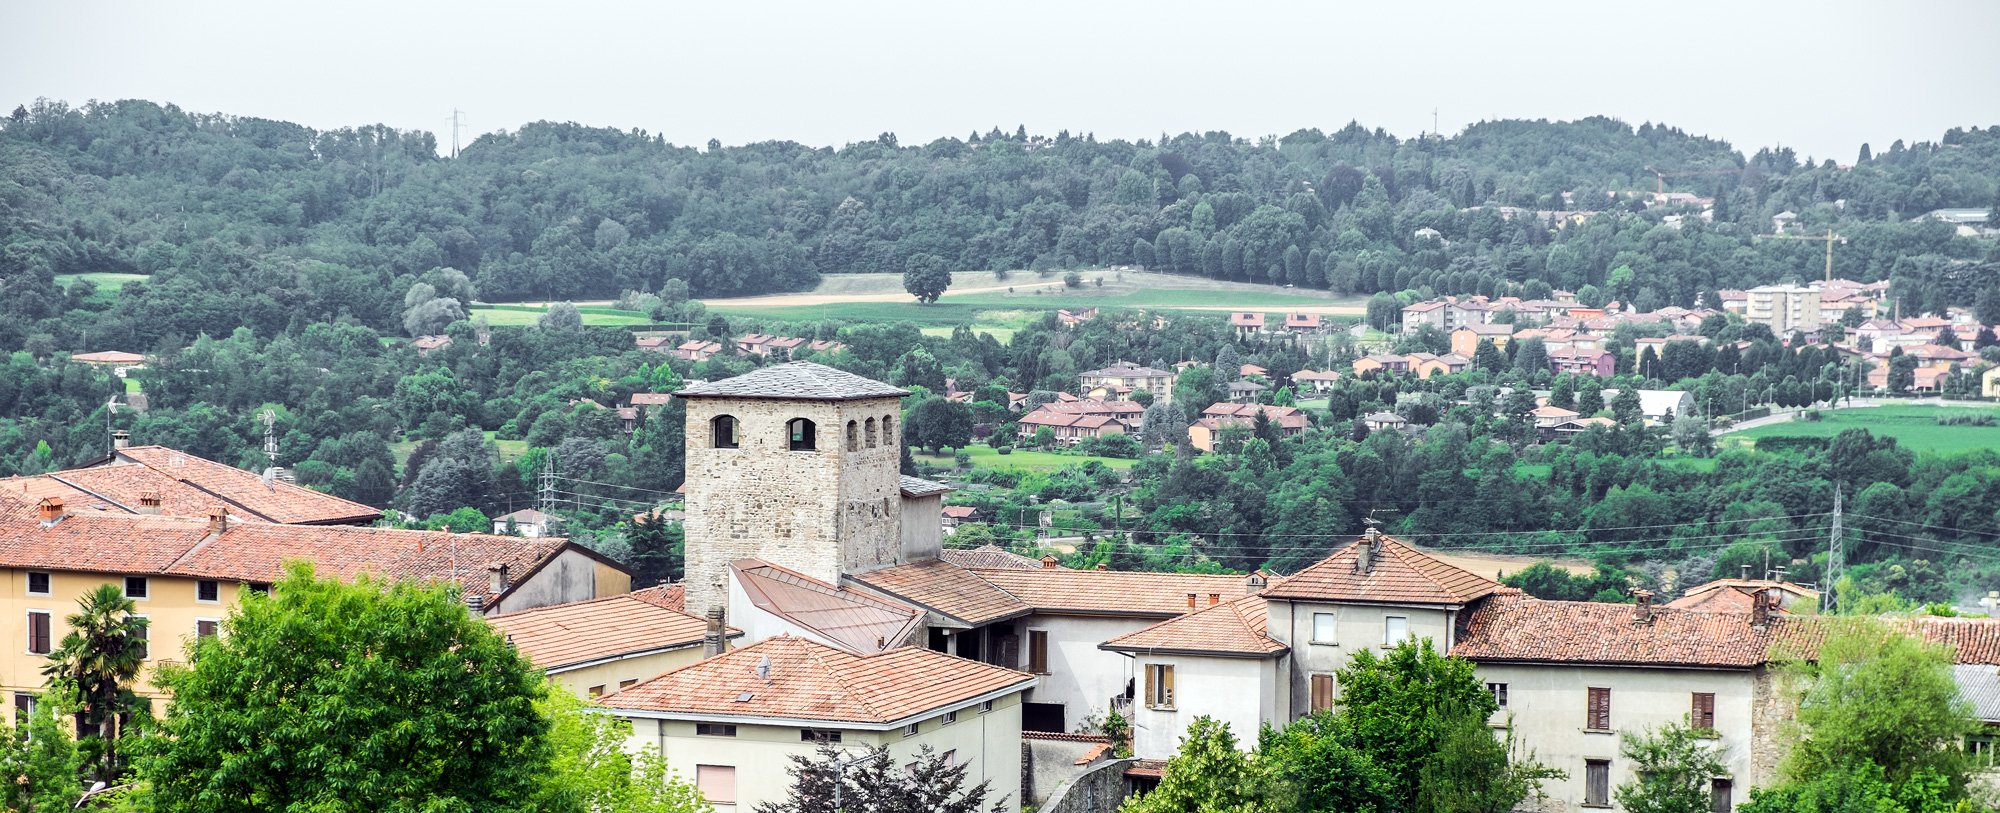 orre del Borgo, CN10 Architetti © Gianluca Gelmini